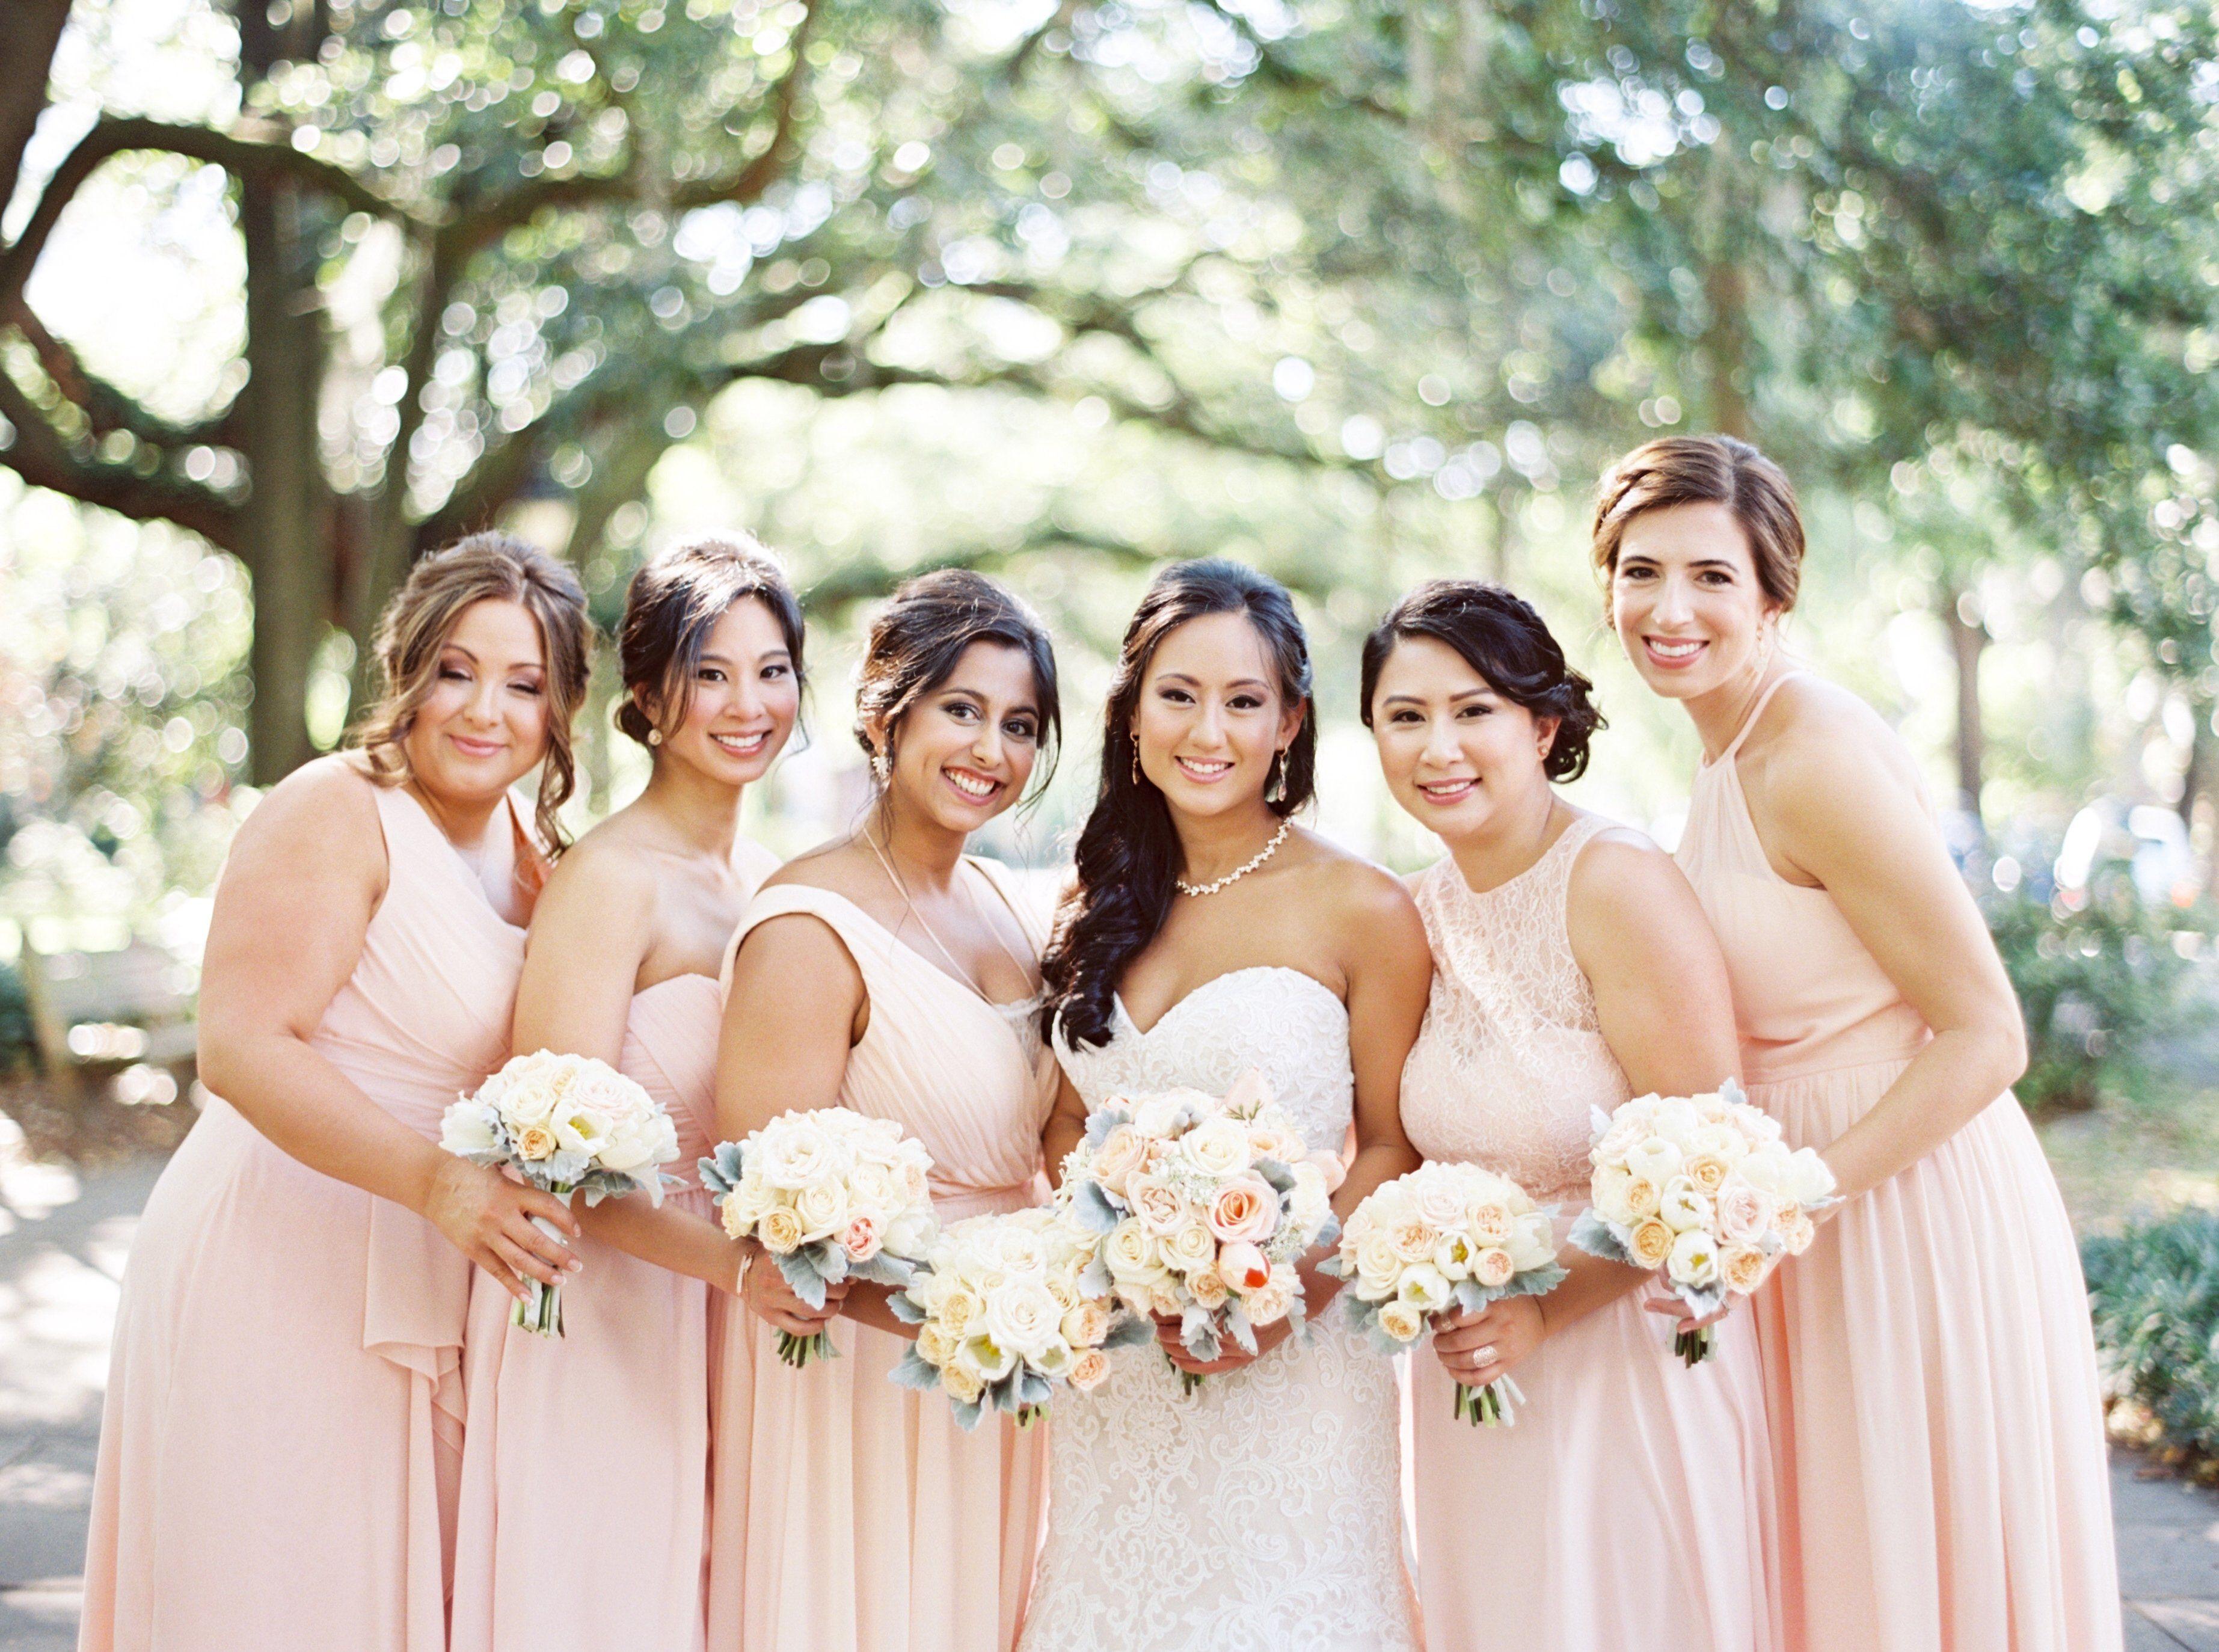 3535b83936b Azazie Bridesmaid Dress Julianna In Chiffon Find The Perfect